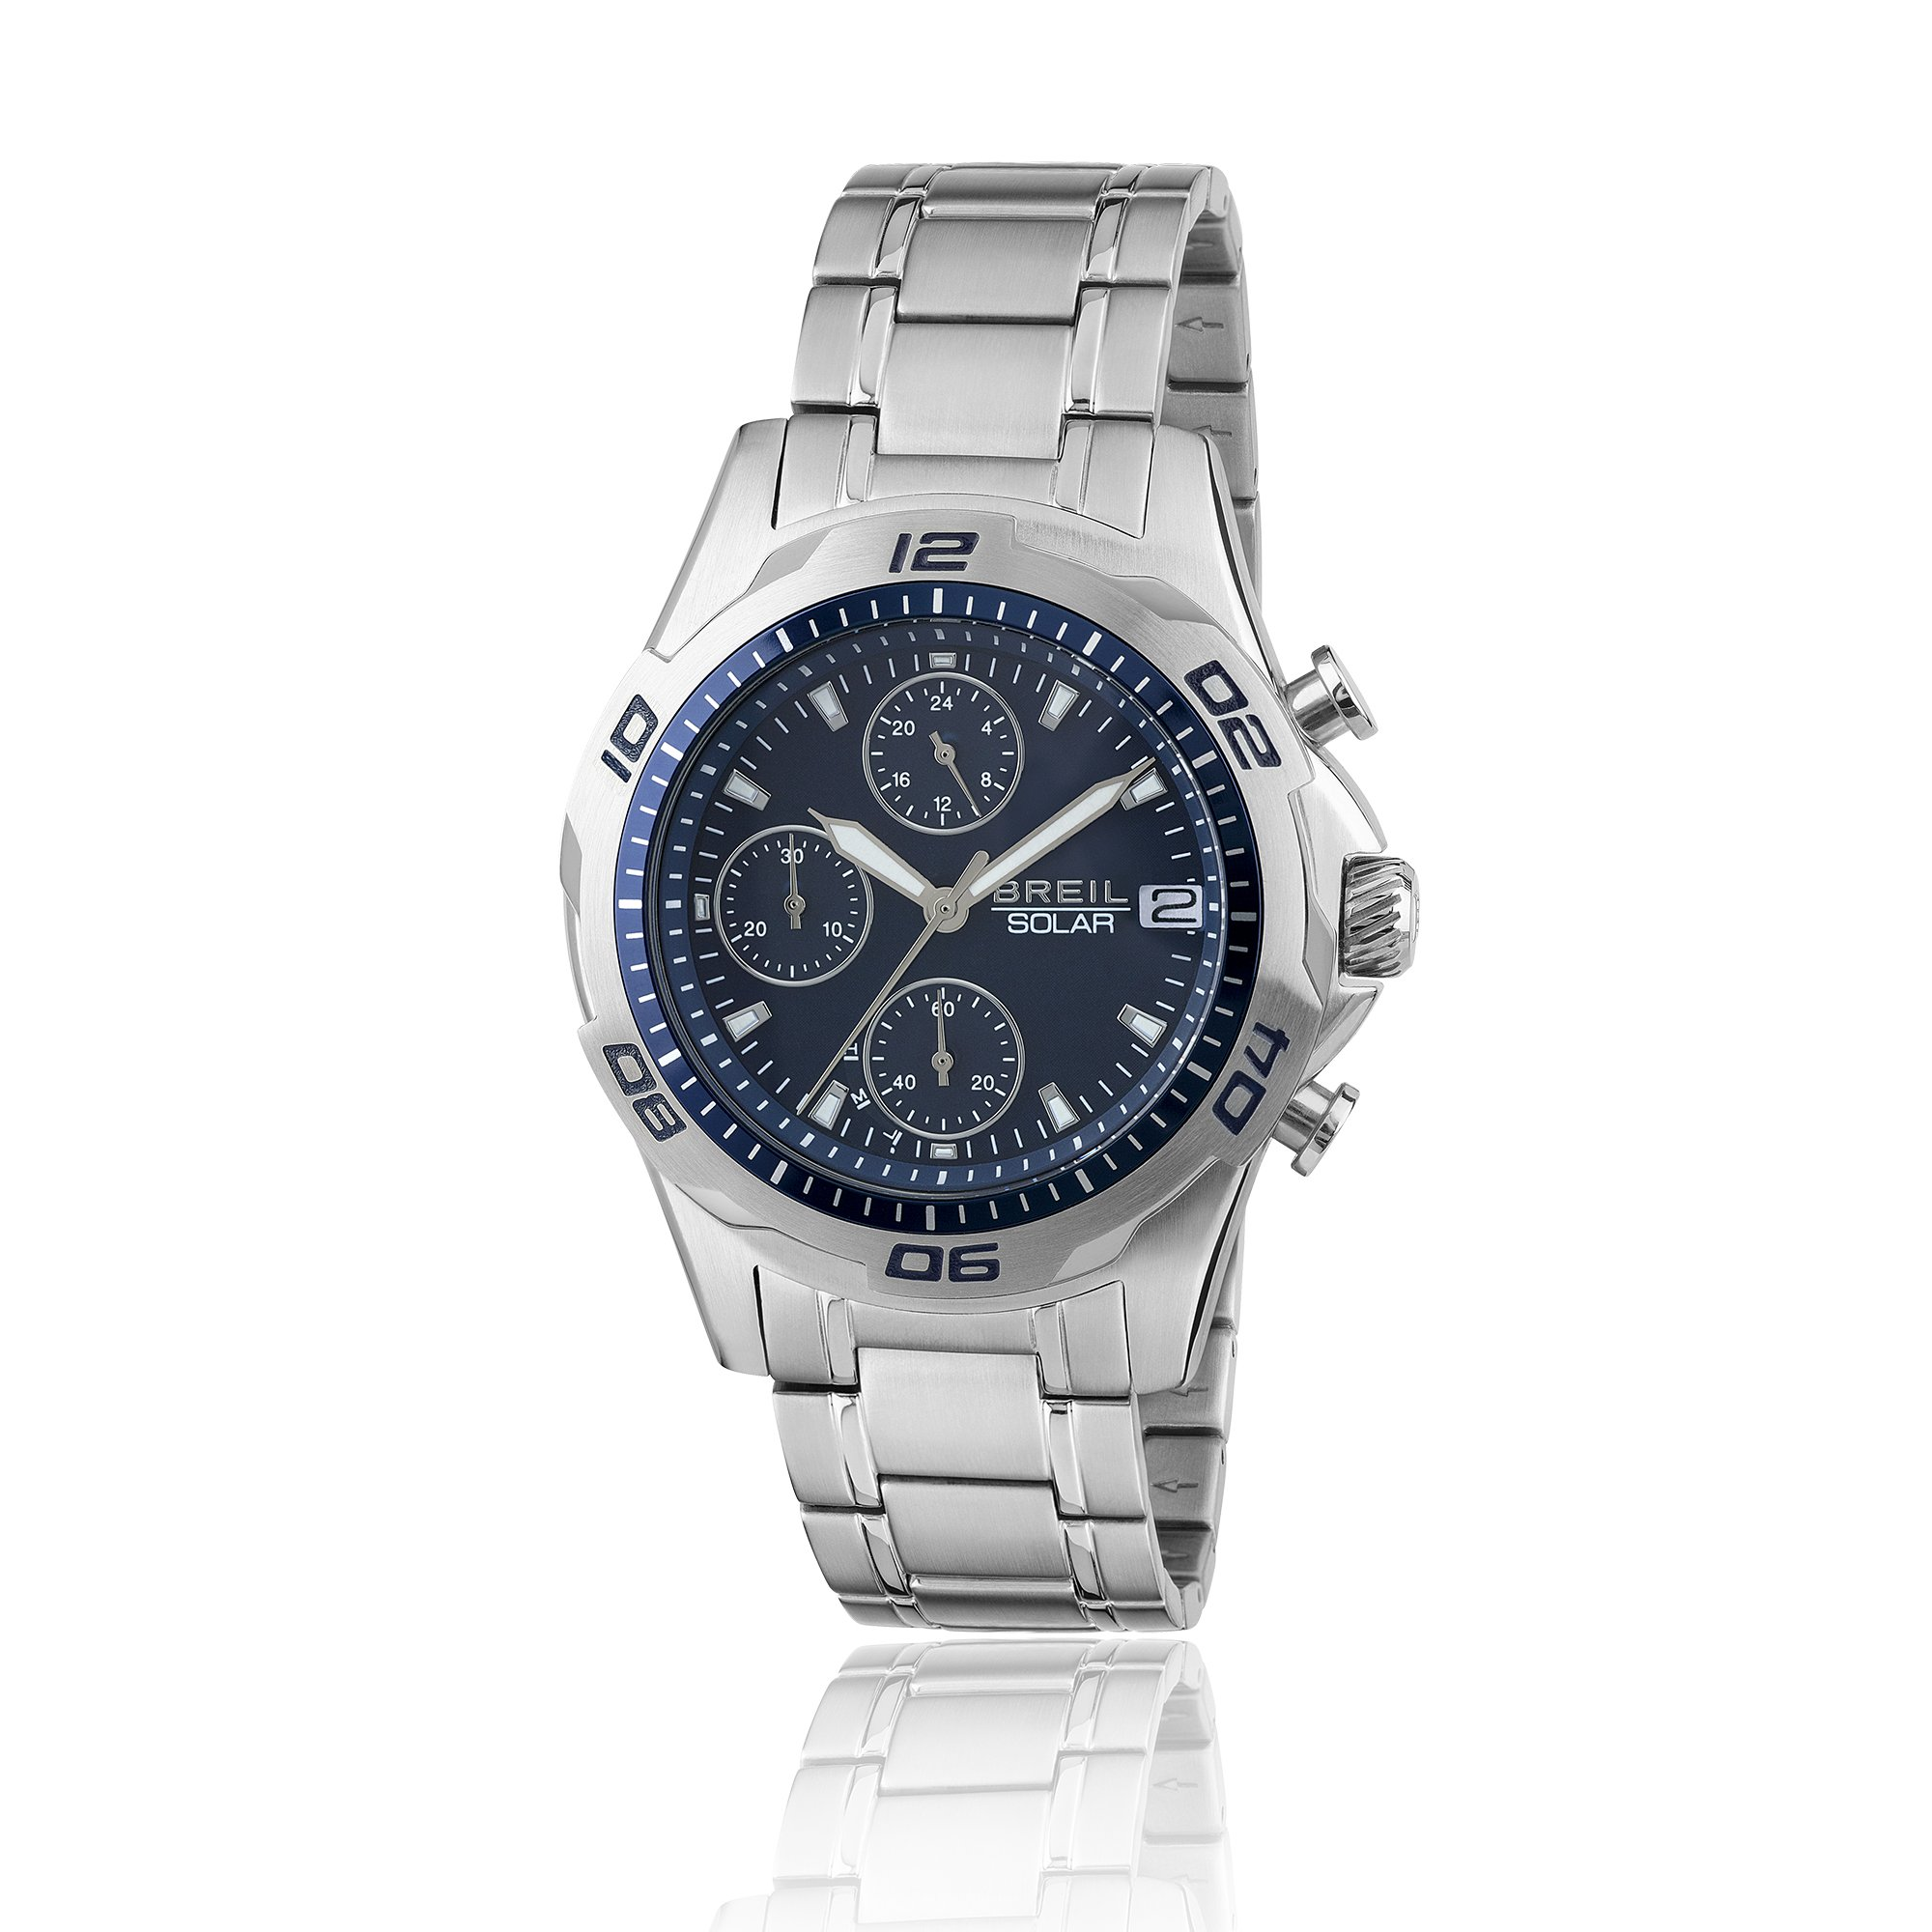 7445c479116fc4 Orologio Breil cronografo Gent uomo TW1769 carica solare blu - in ...